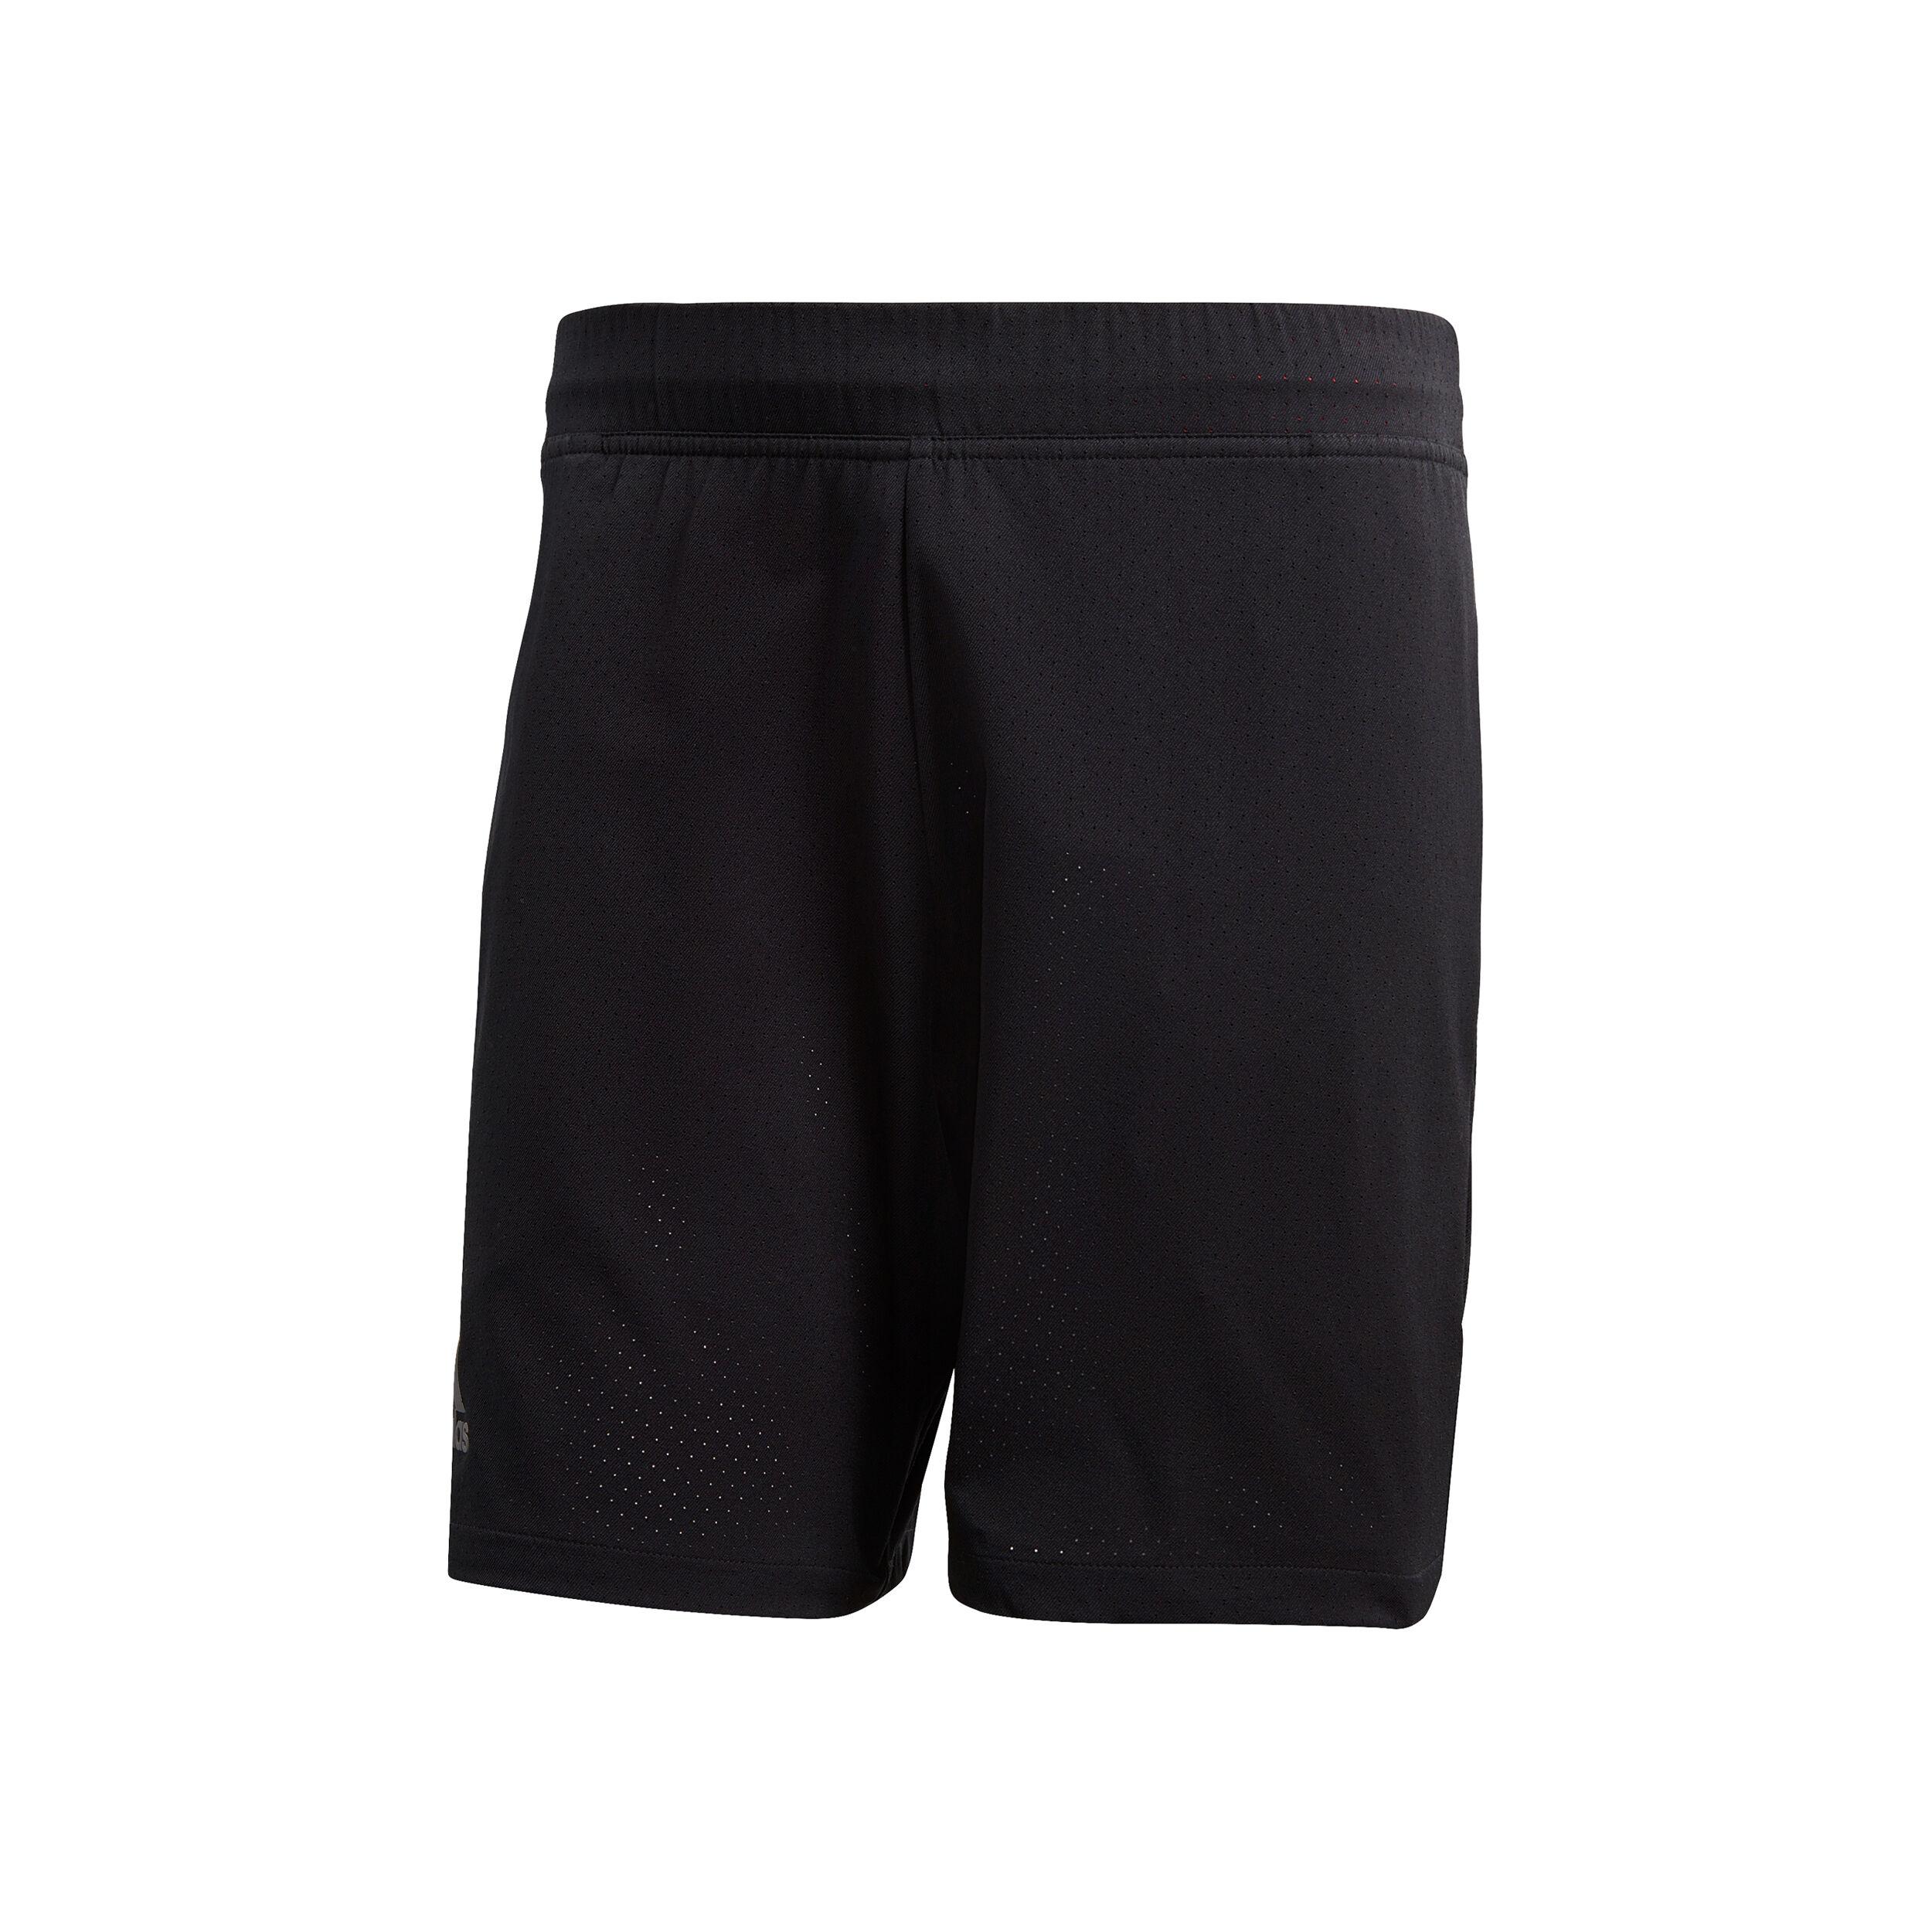 adidas Barricade Shorts Herren Schwarz, Dunkelgrau online